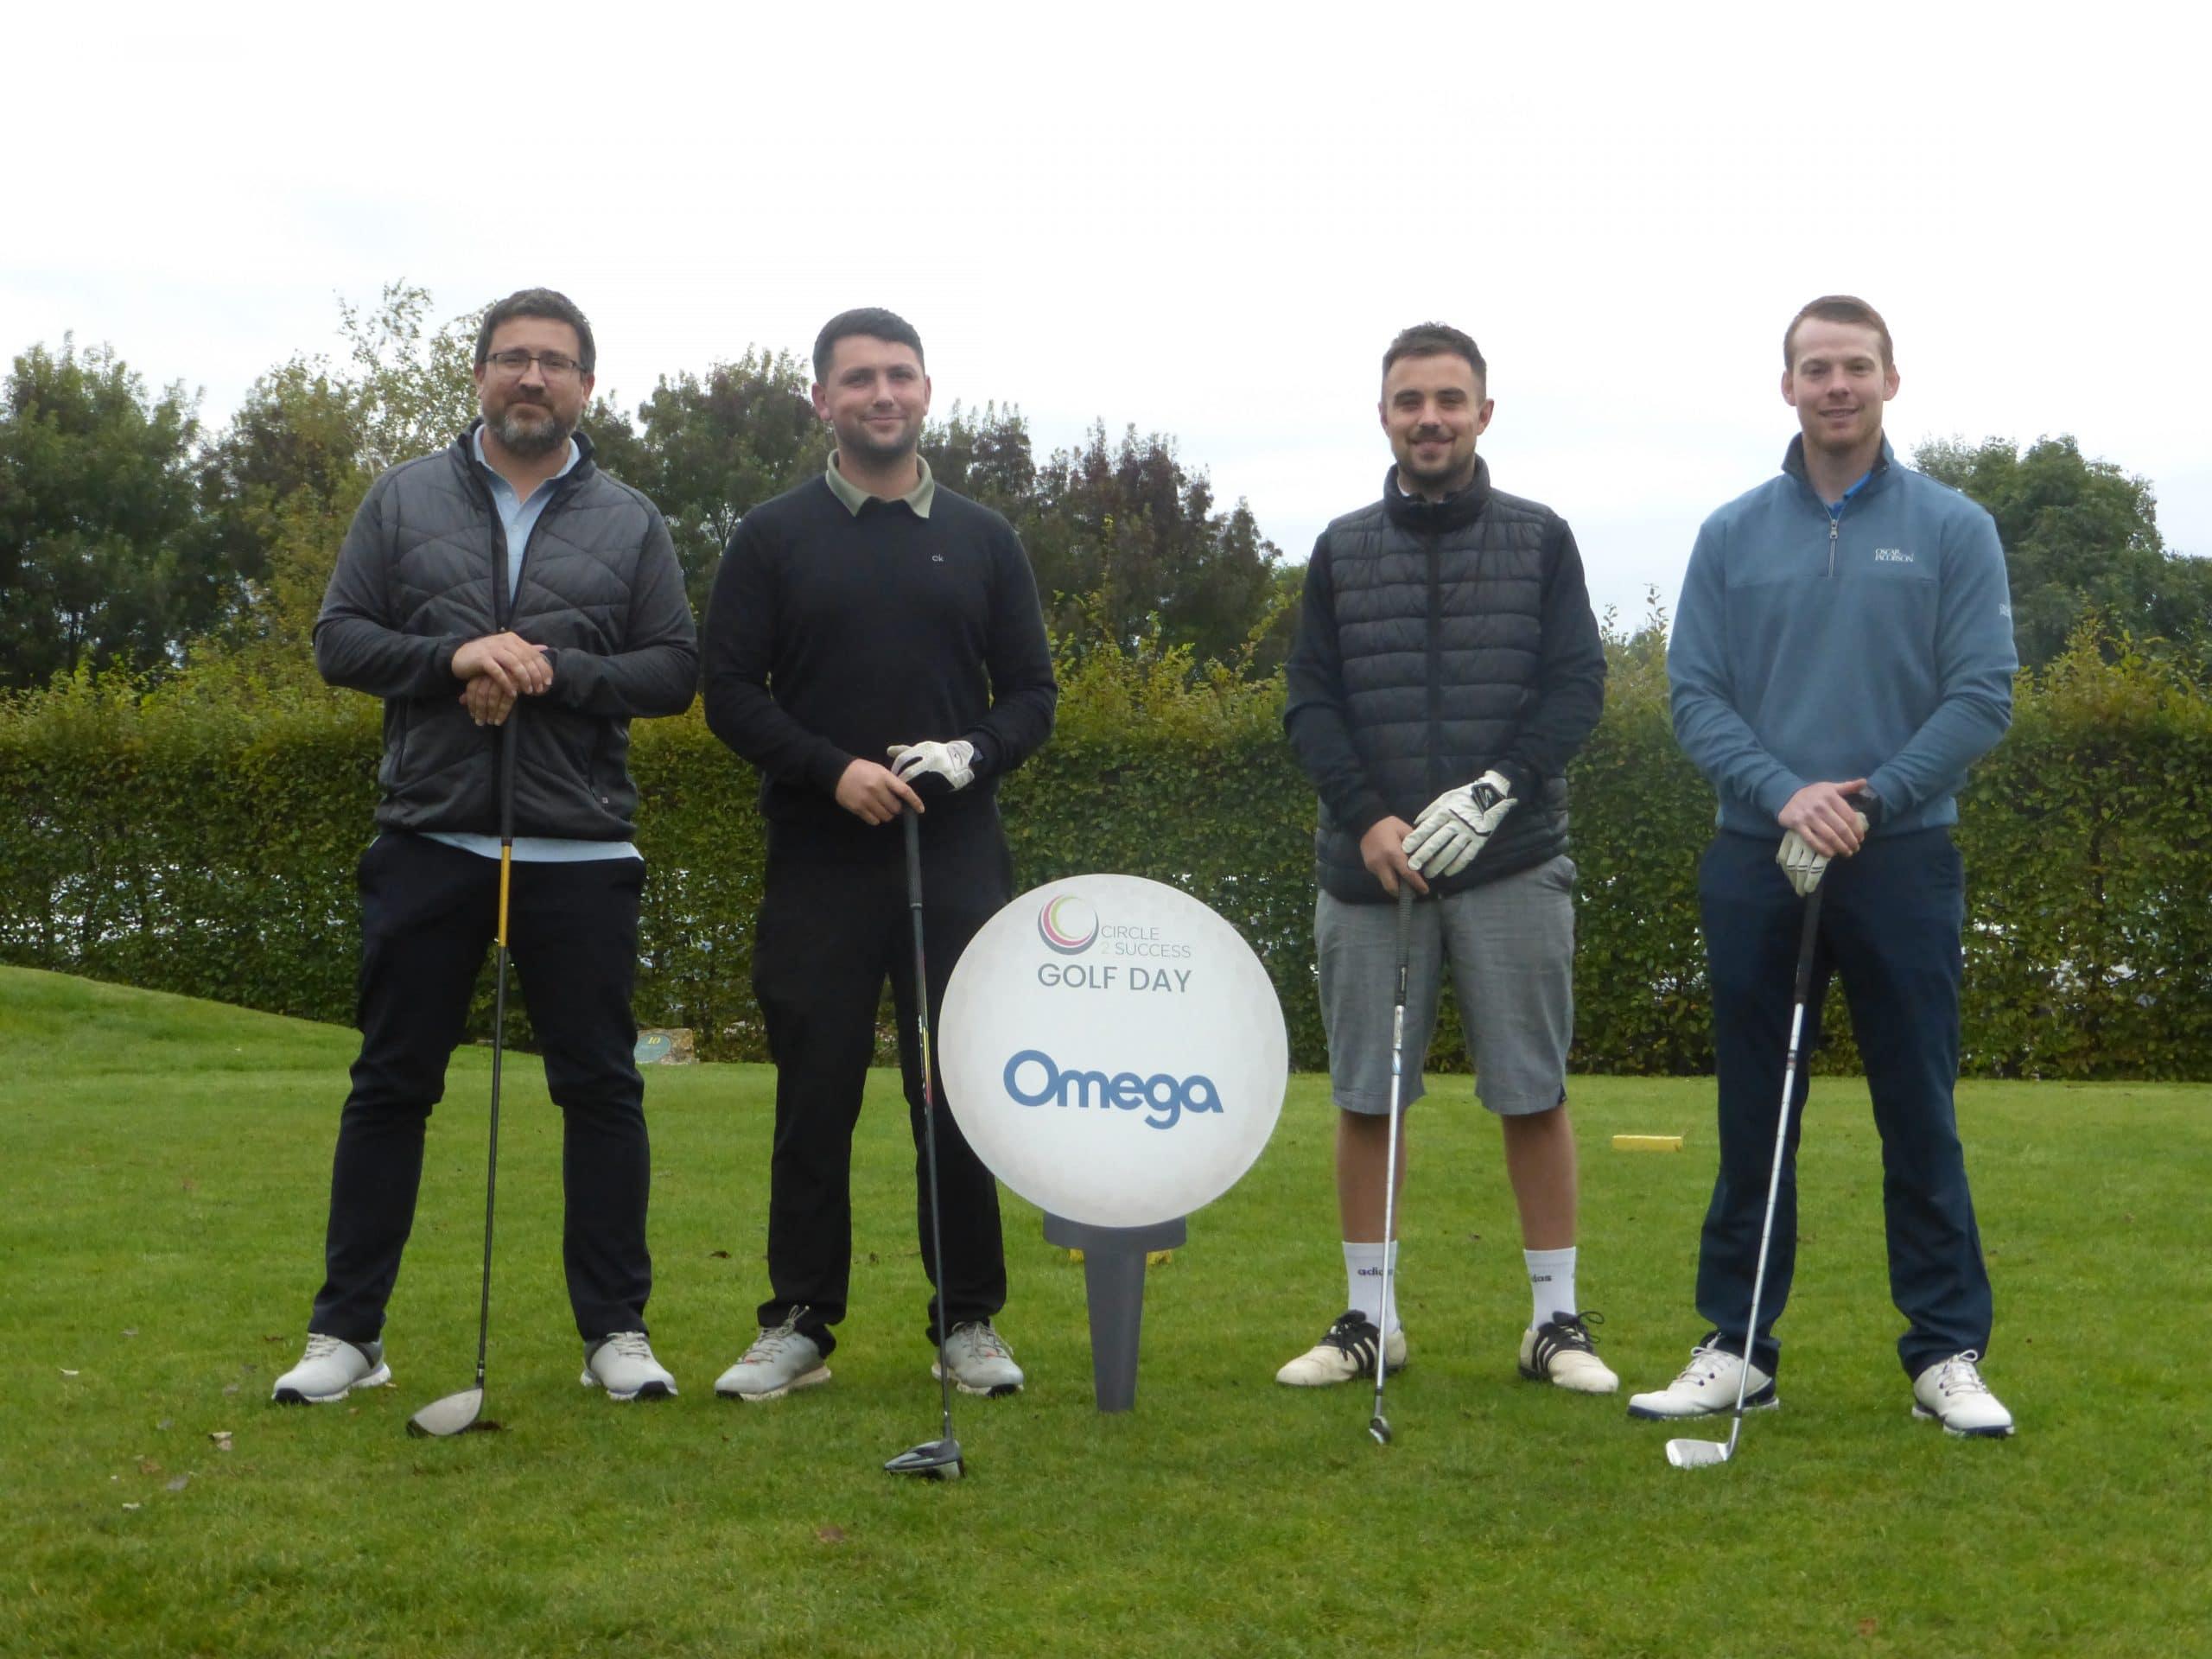 C2S Charity Golf Day at Brickhampton Golf Complex